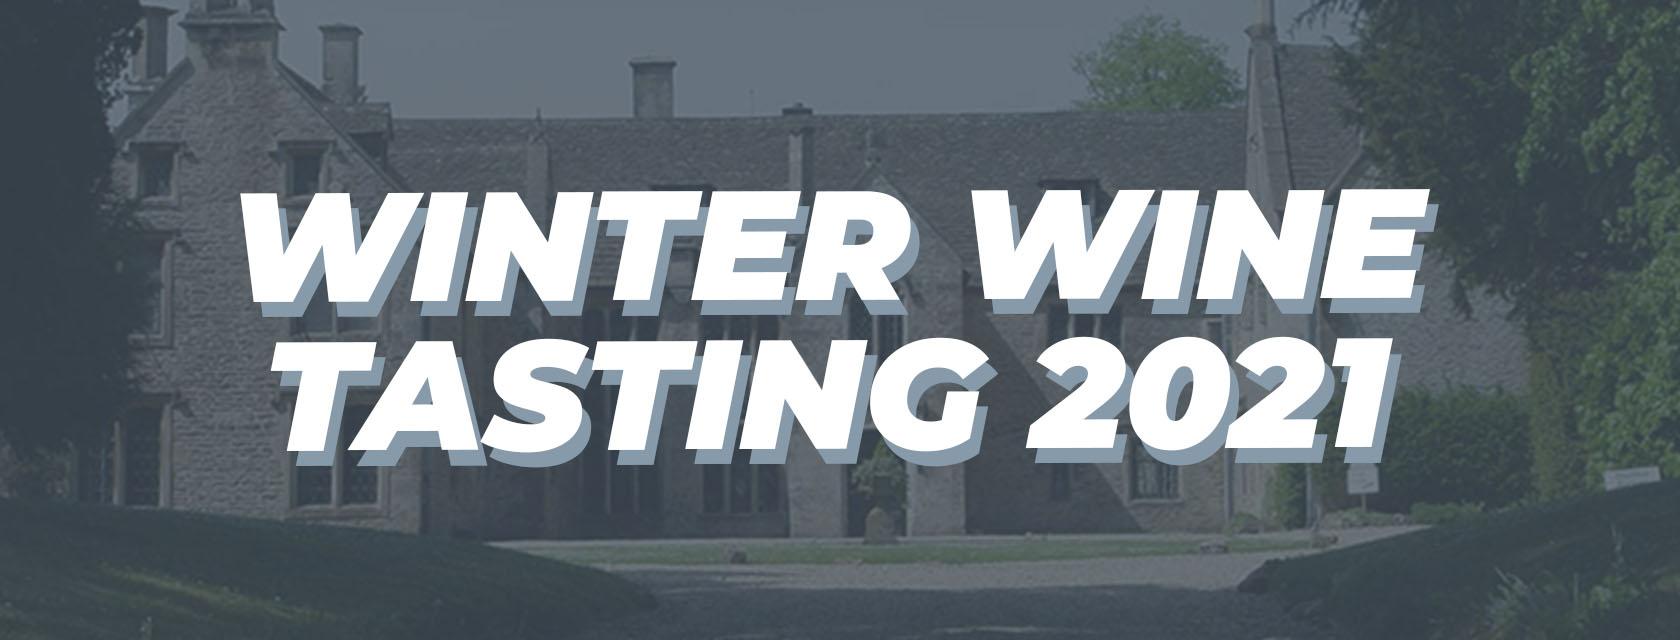 Winter Wine Tasting Ticket Banner Image